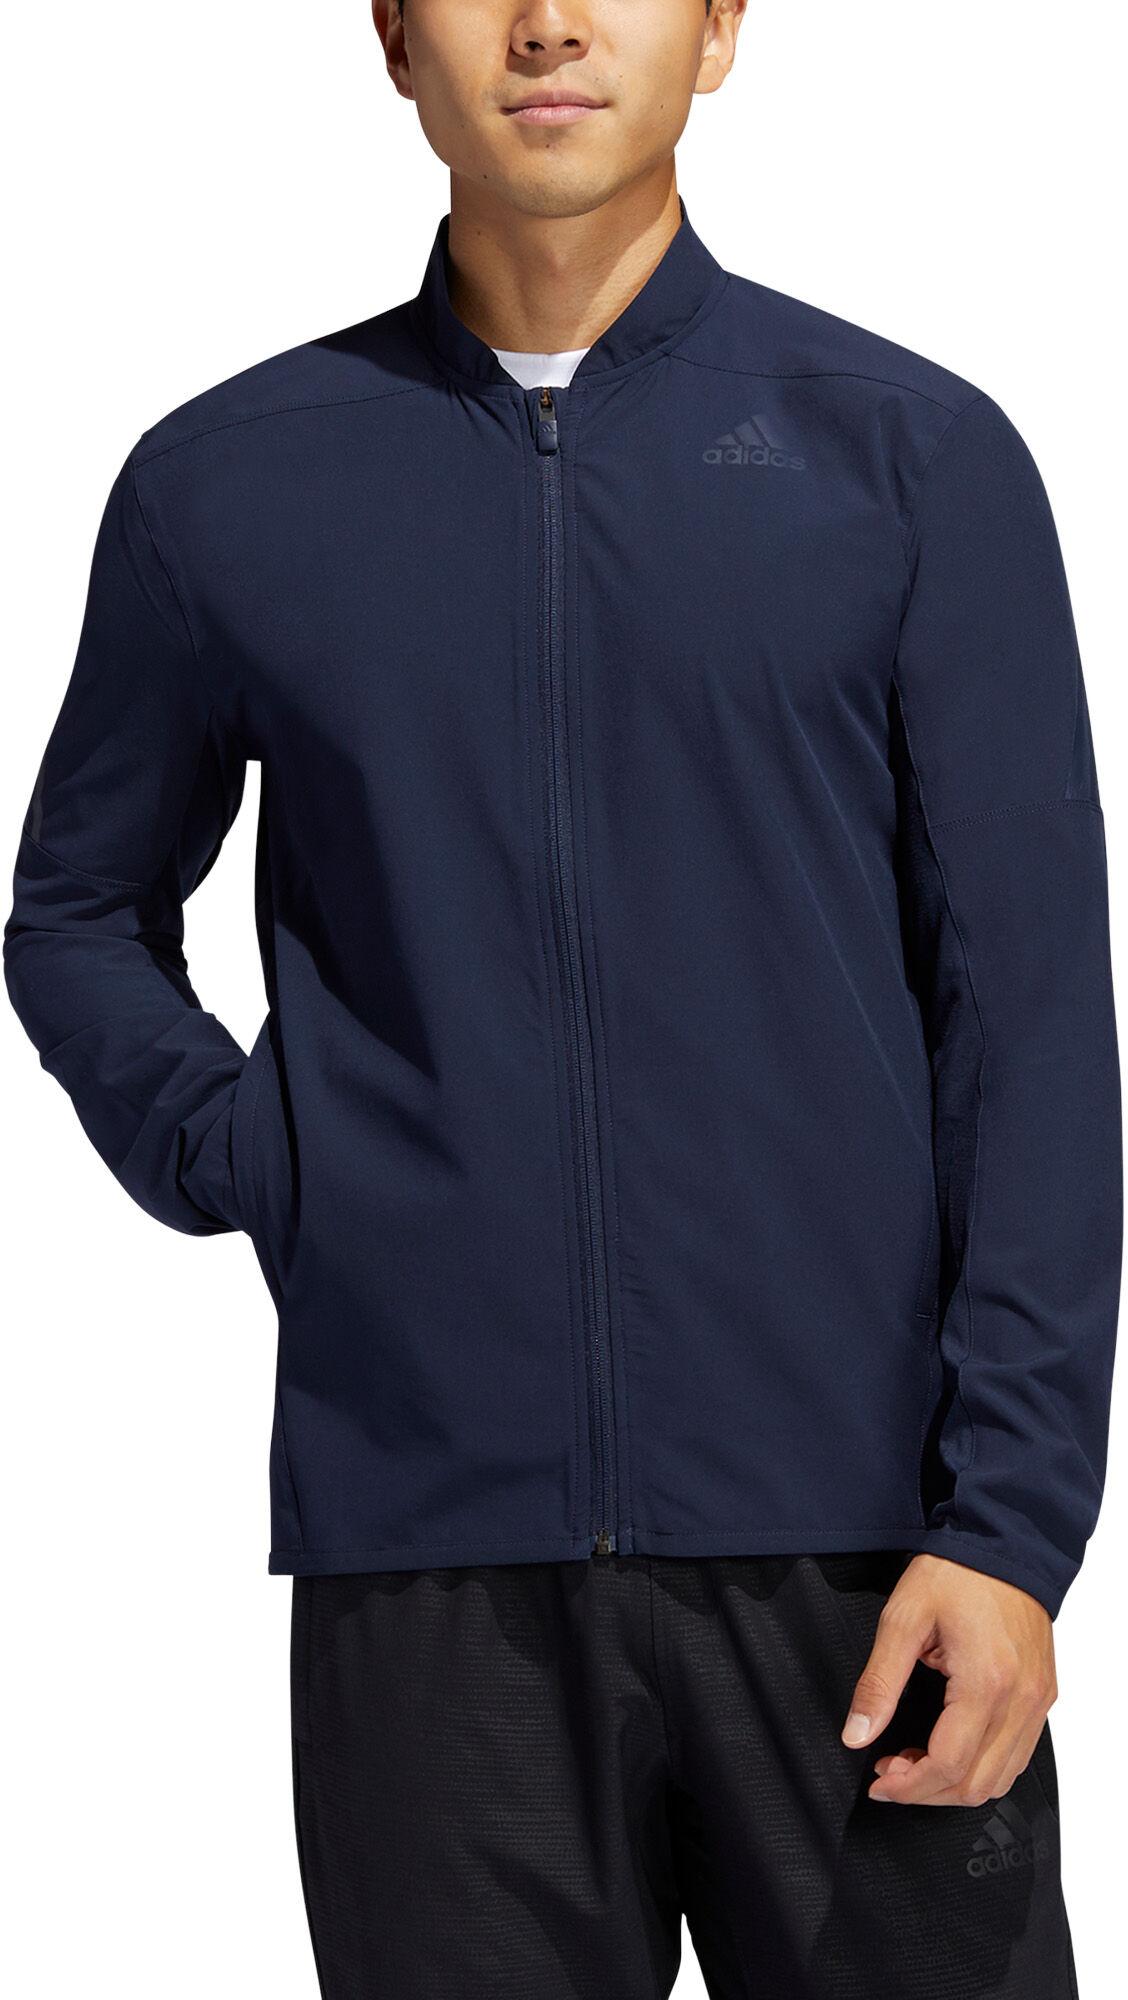 Aeroready 3 Stripes Trainingsjacke · blau · Herren » adidas